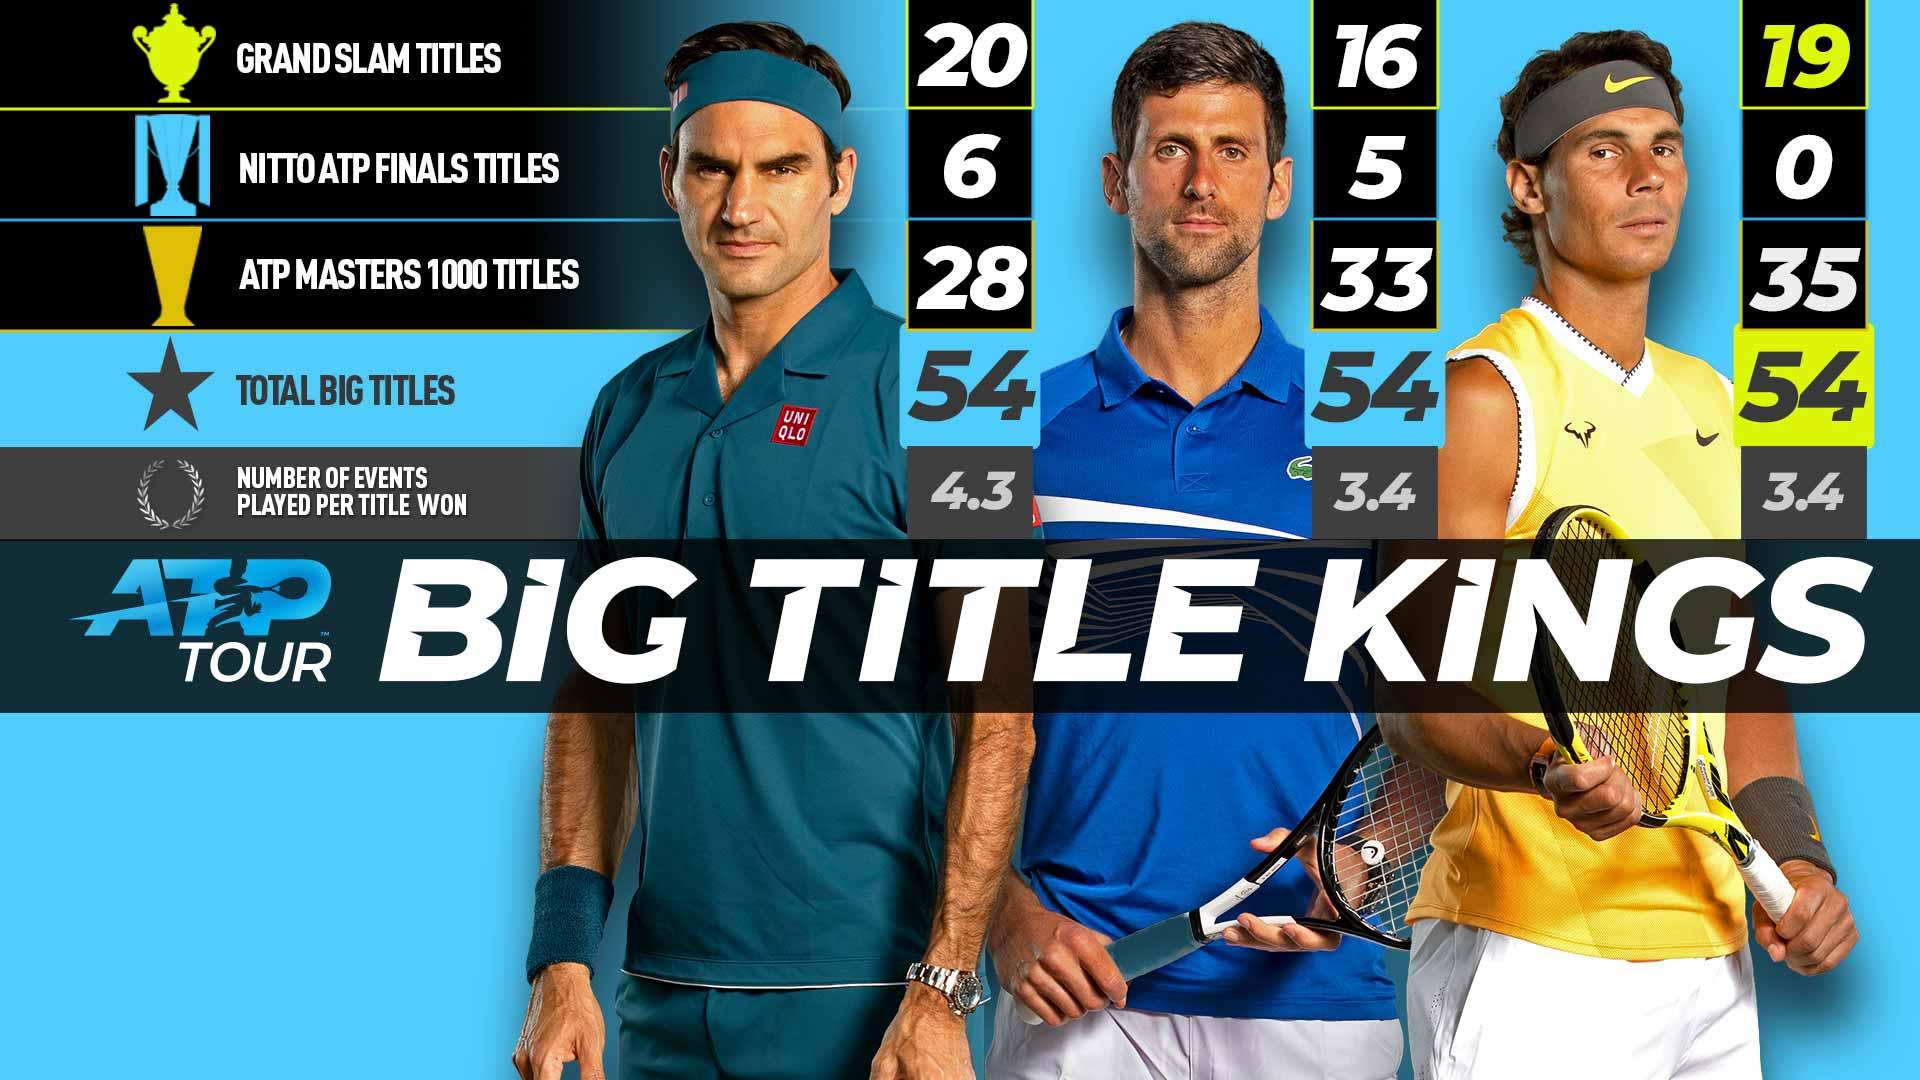 Nadal Ties Federer & Djokovic For 'Big Titles' Lead | ATP Tour | Tennis